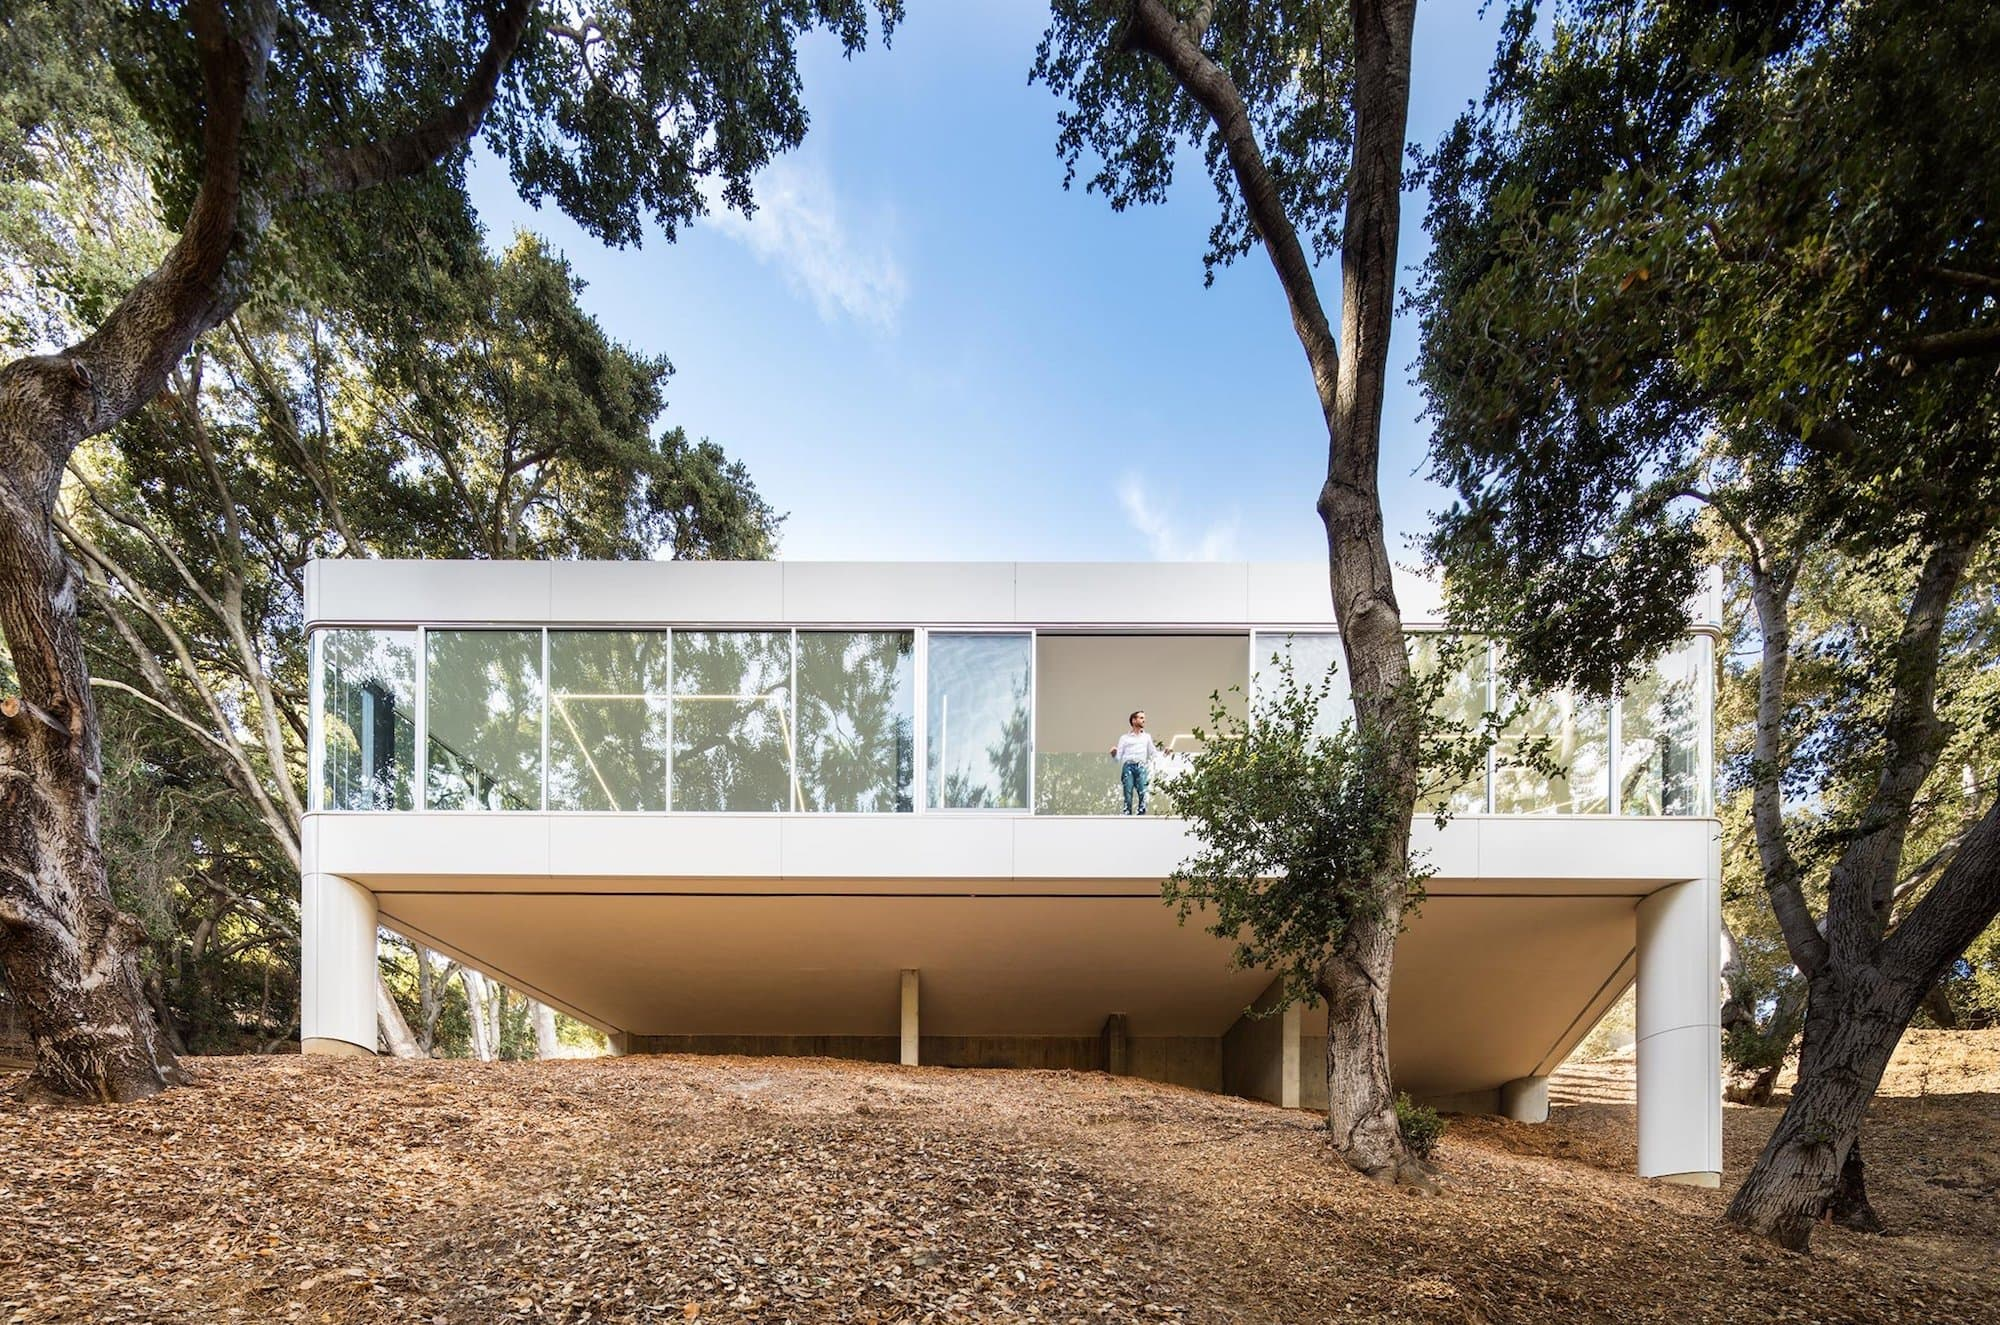 Licht ist Leben: Pam & Paul's House by Craig Steely Architecture 2